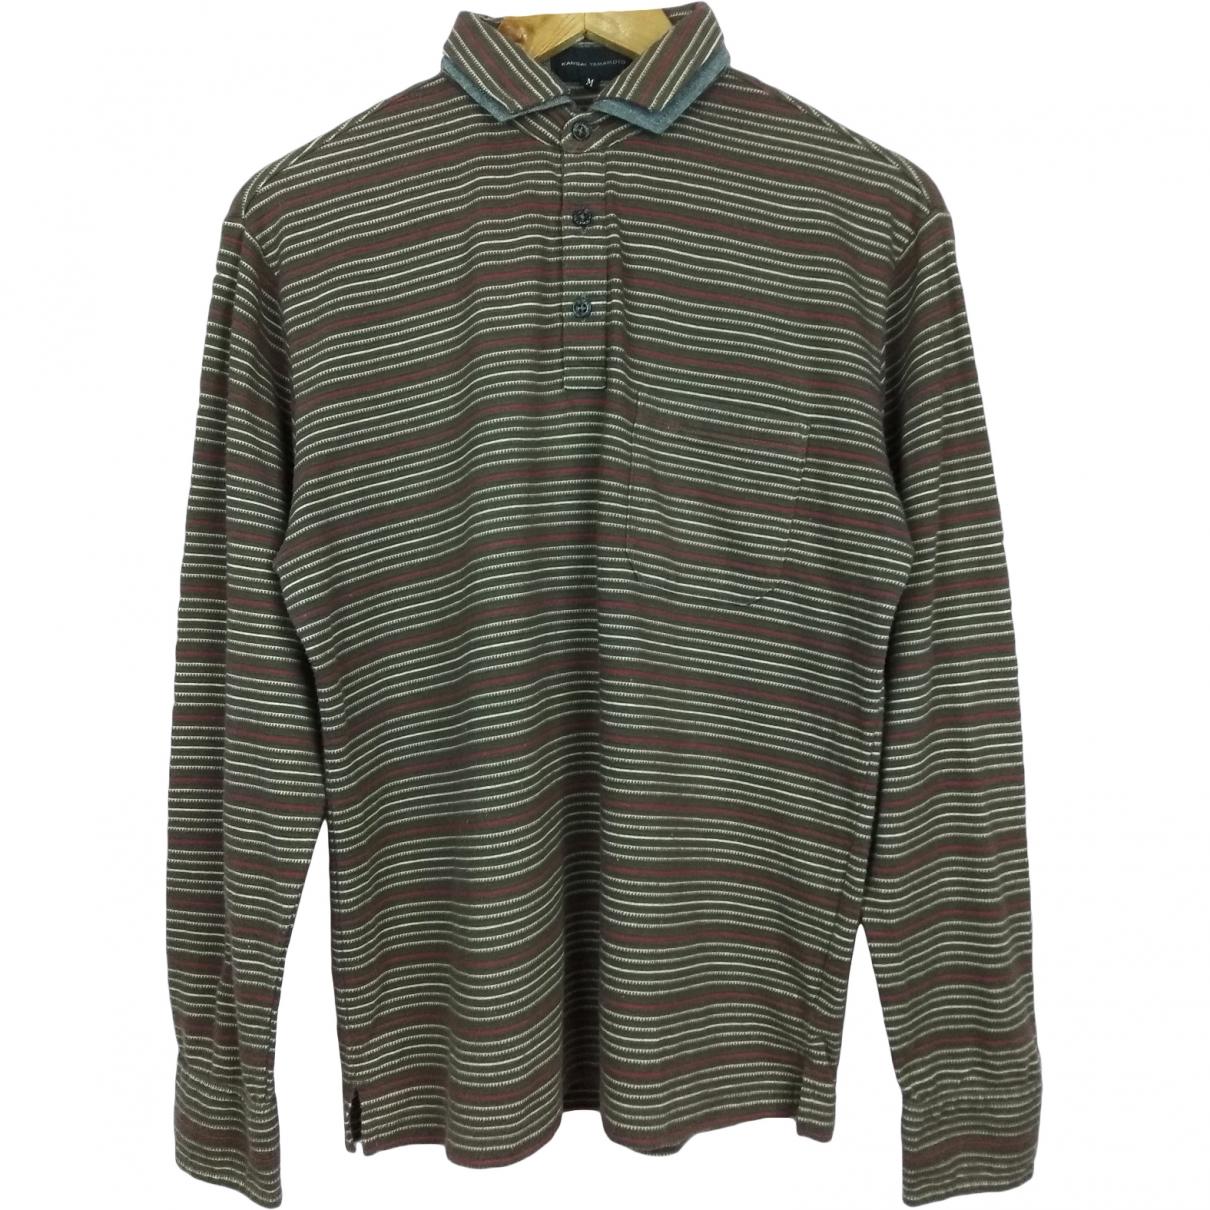 Kansai Yamamoto \N Brown Cotton Polo shirts for Men M International